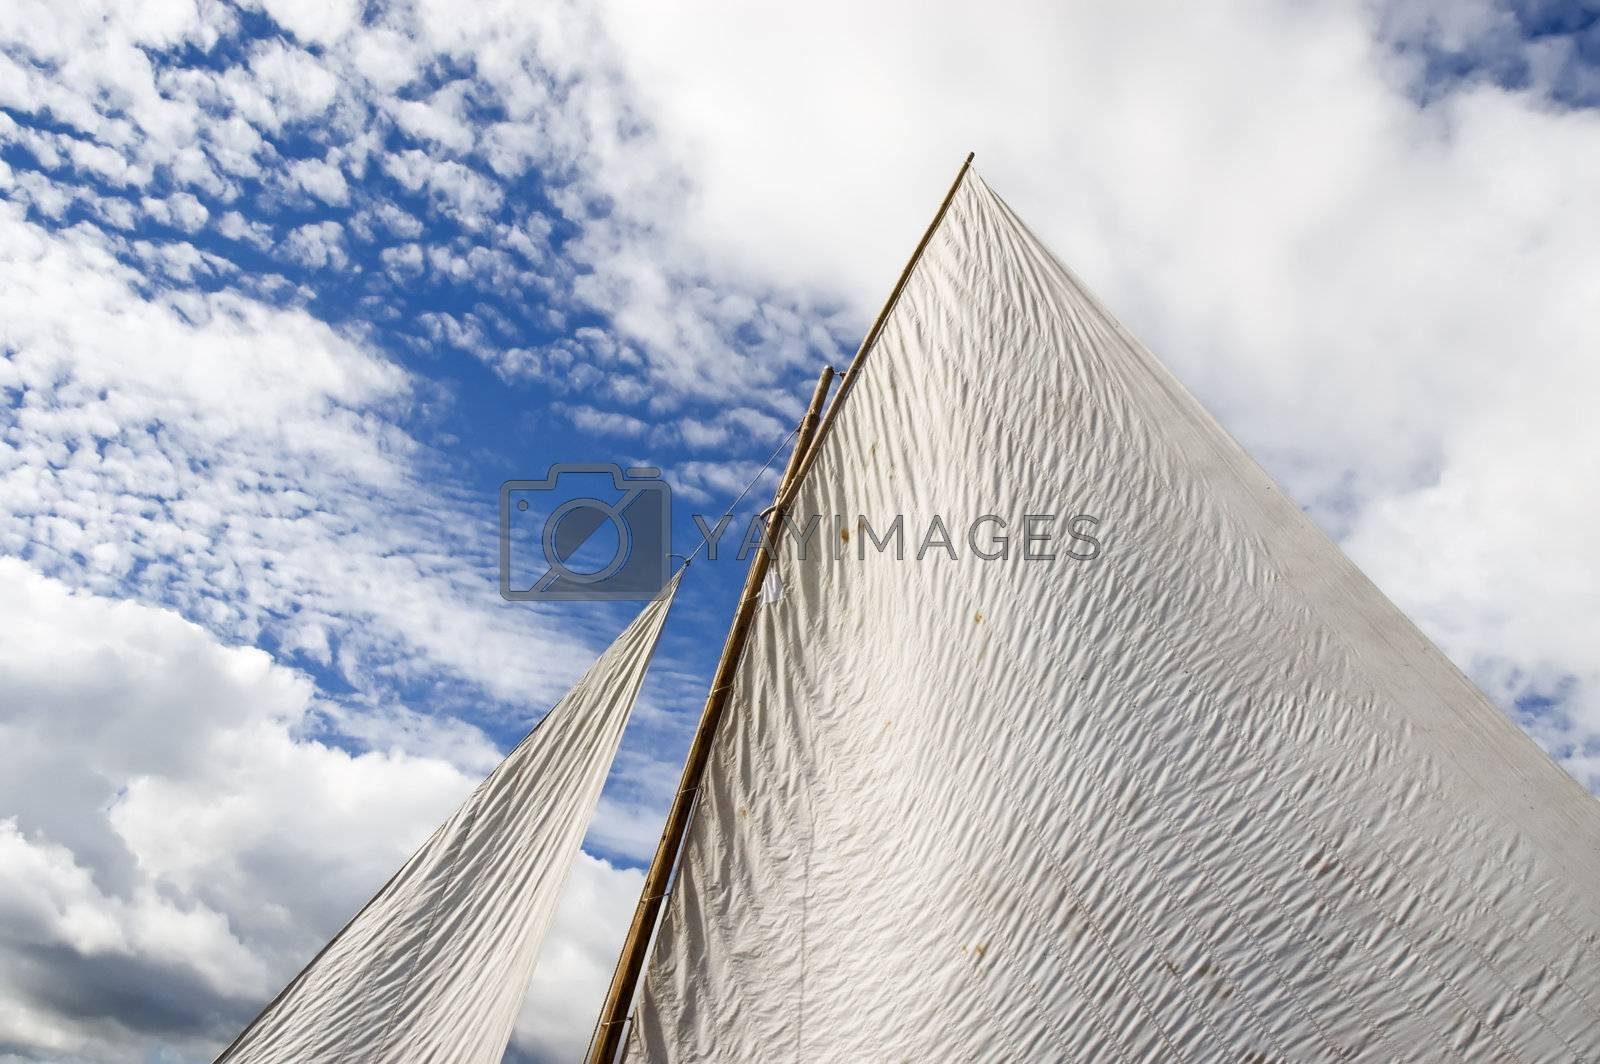 Sail against a blue sky